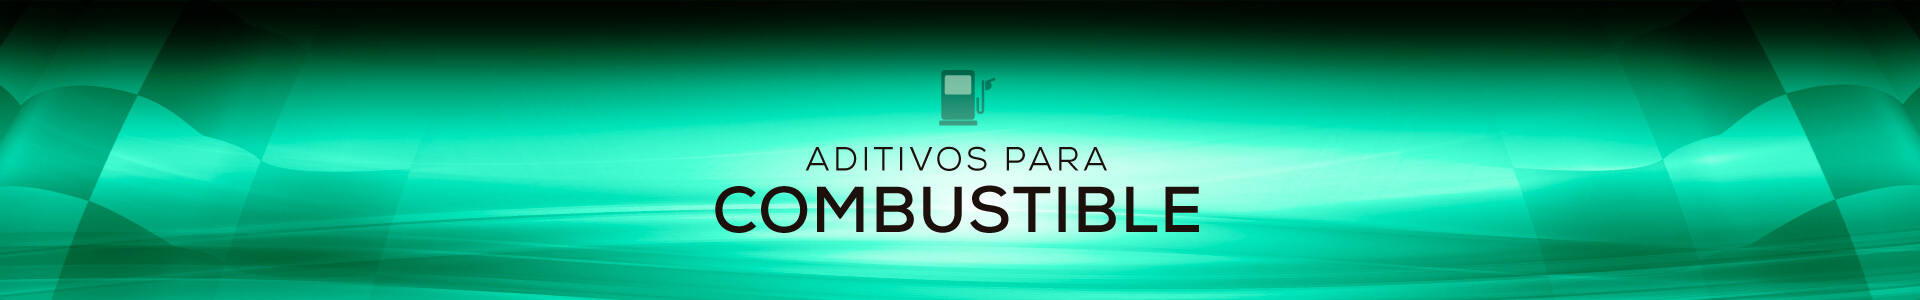 aditivos_para_combustible-1920x300-v